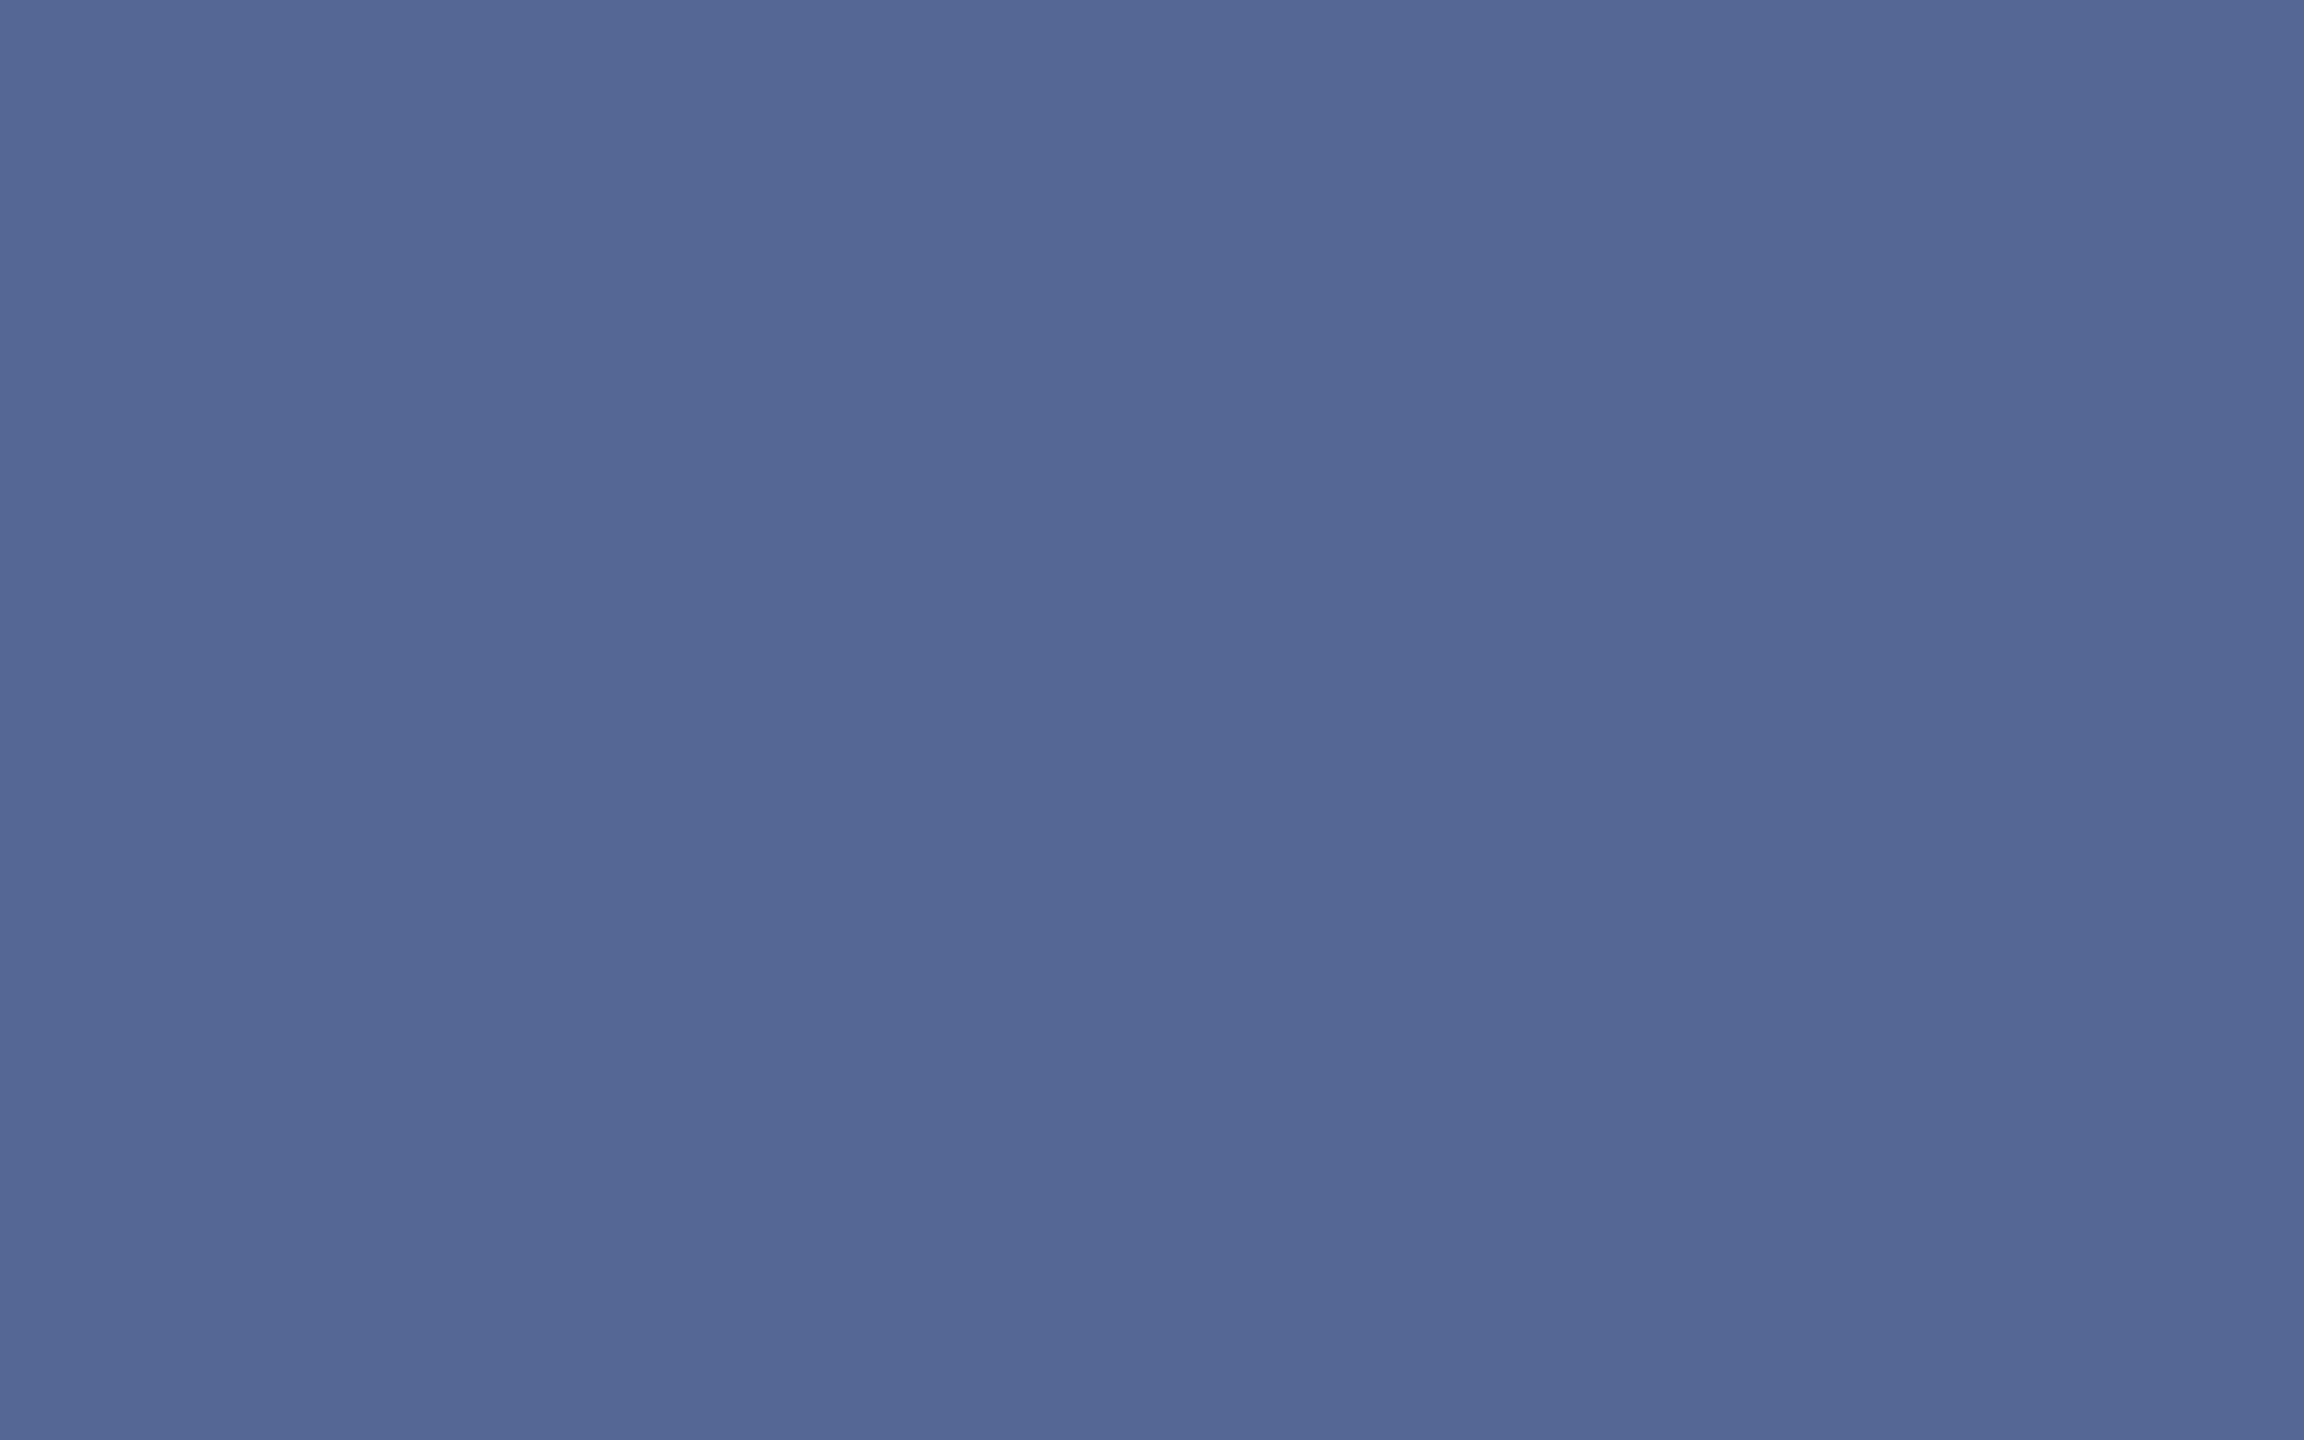 2304x1440 UCLA Blue Solid Color Background